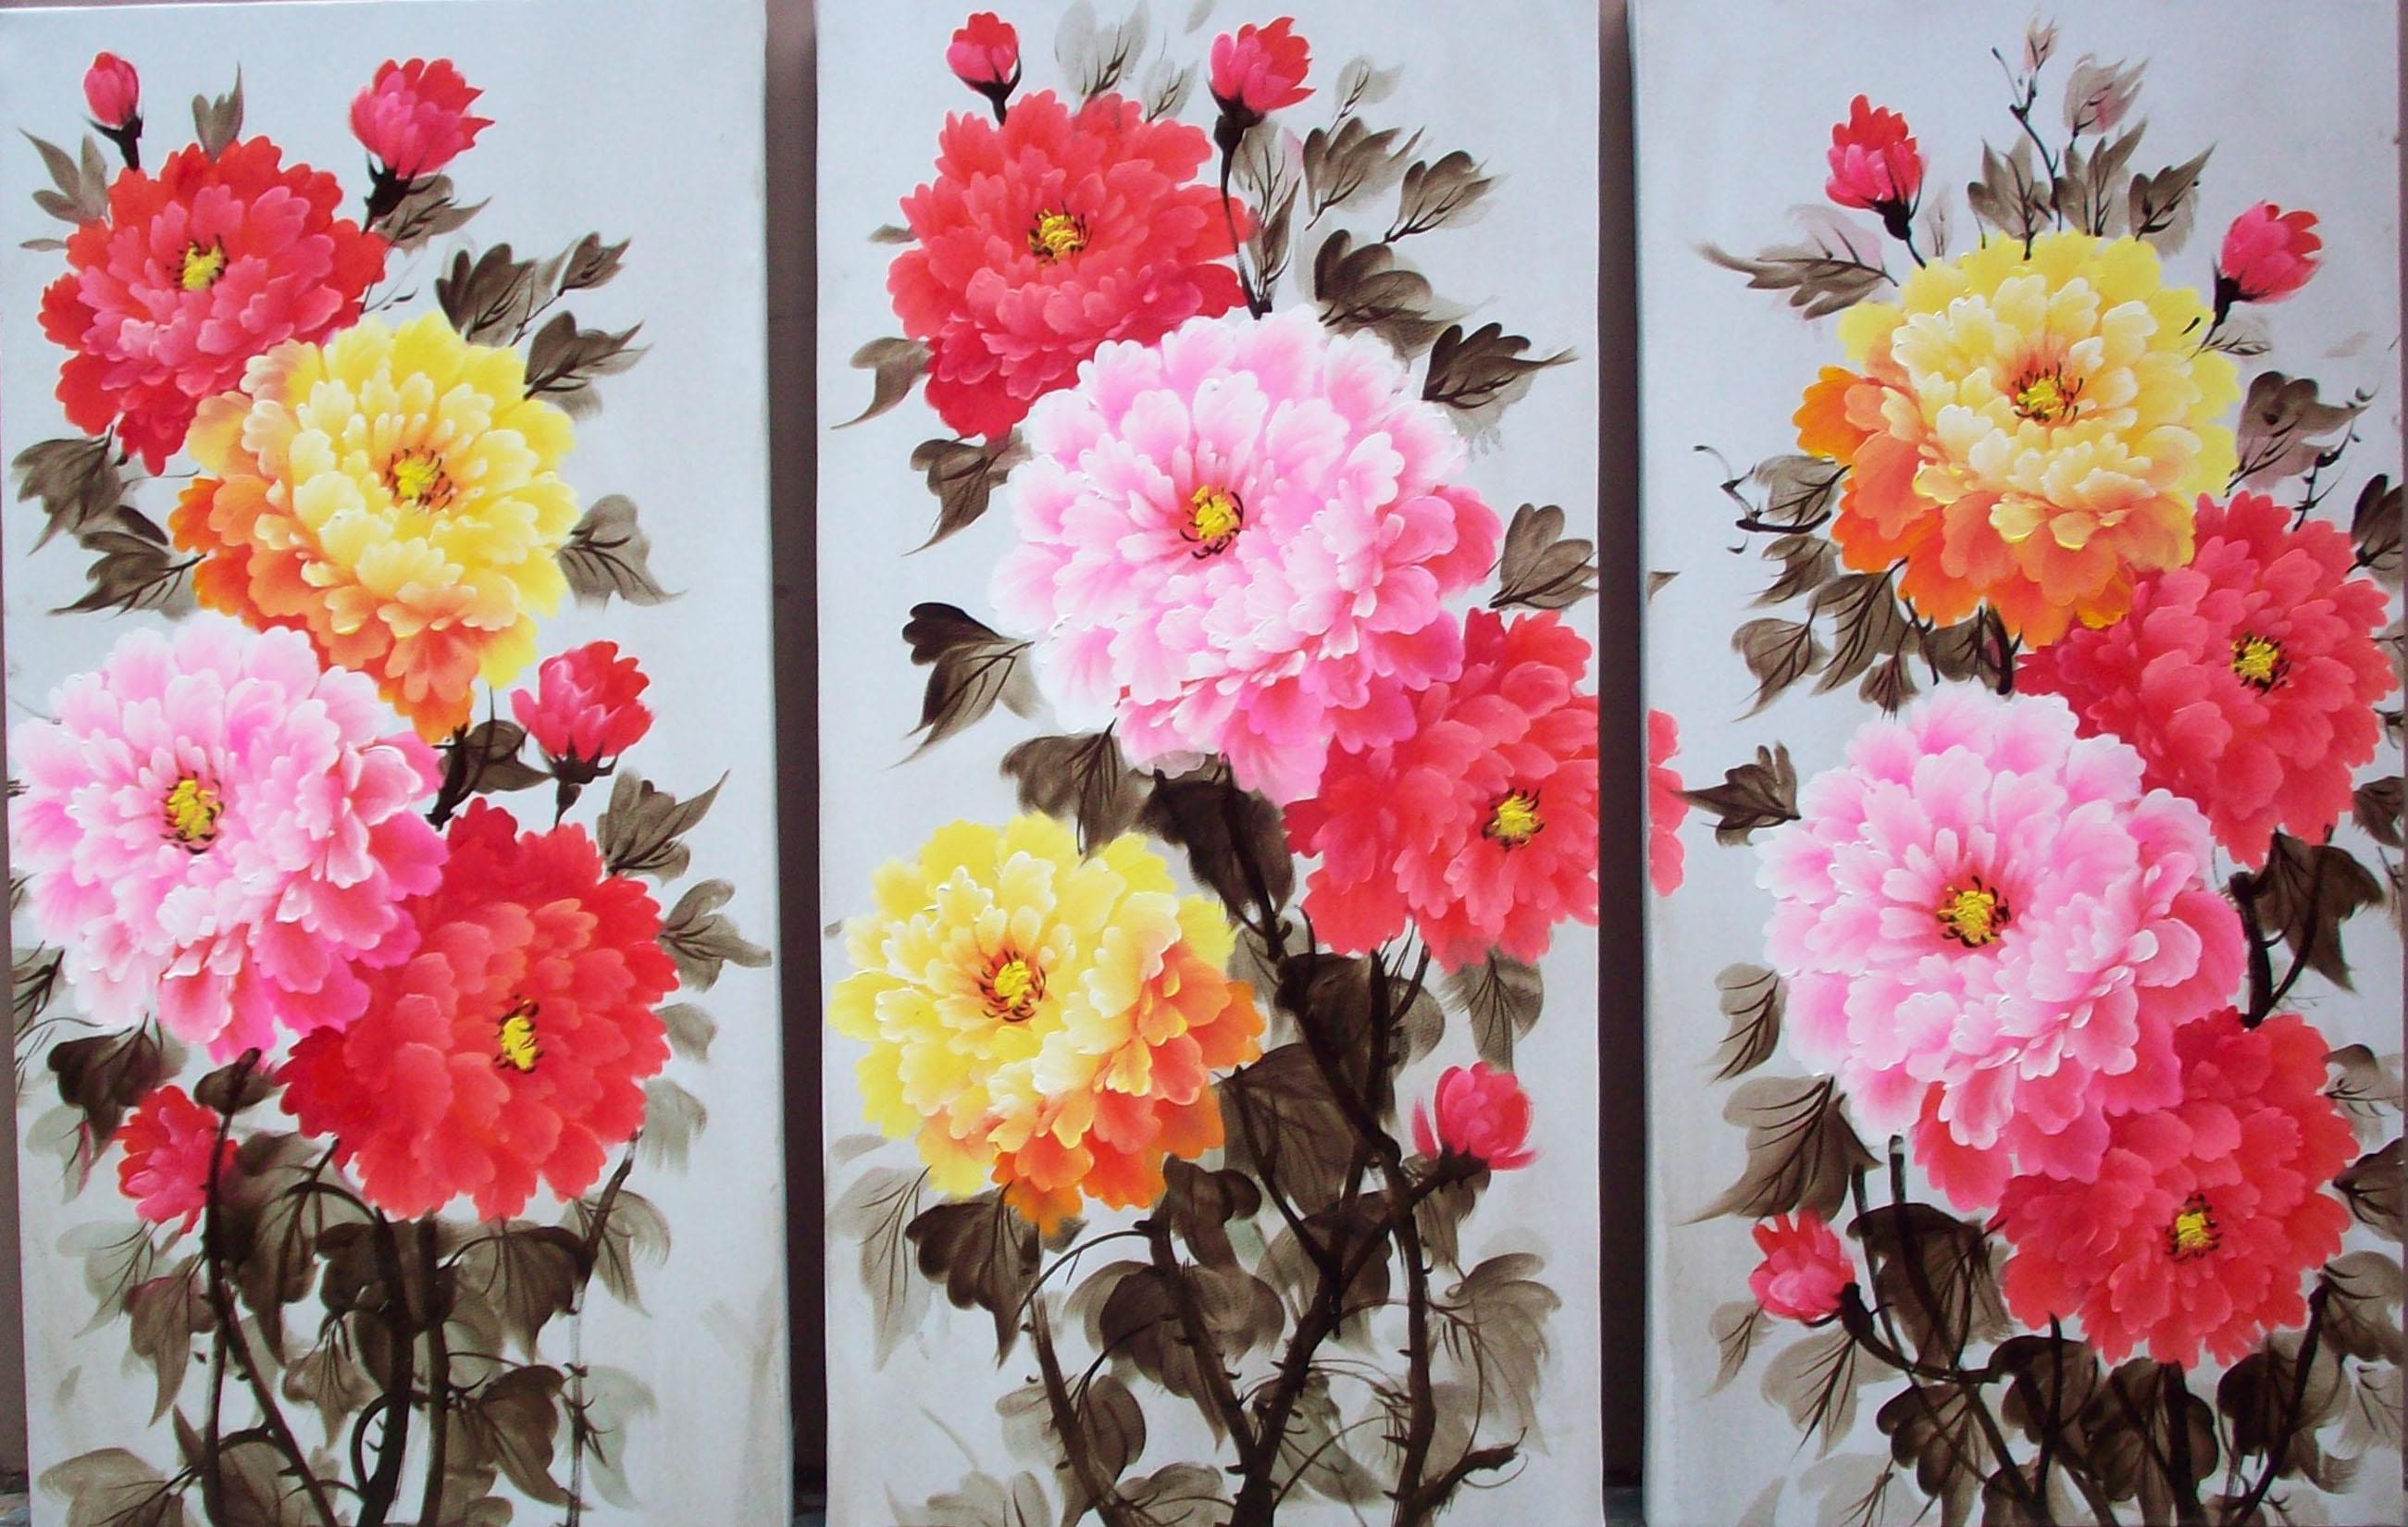 Colorful Flowers Painting Colorful Flowers Painting